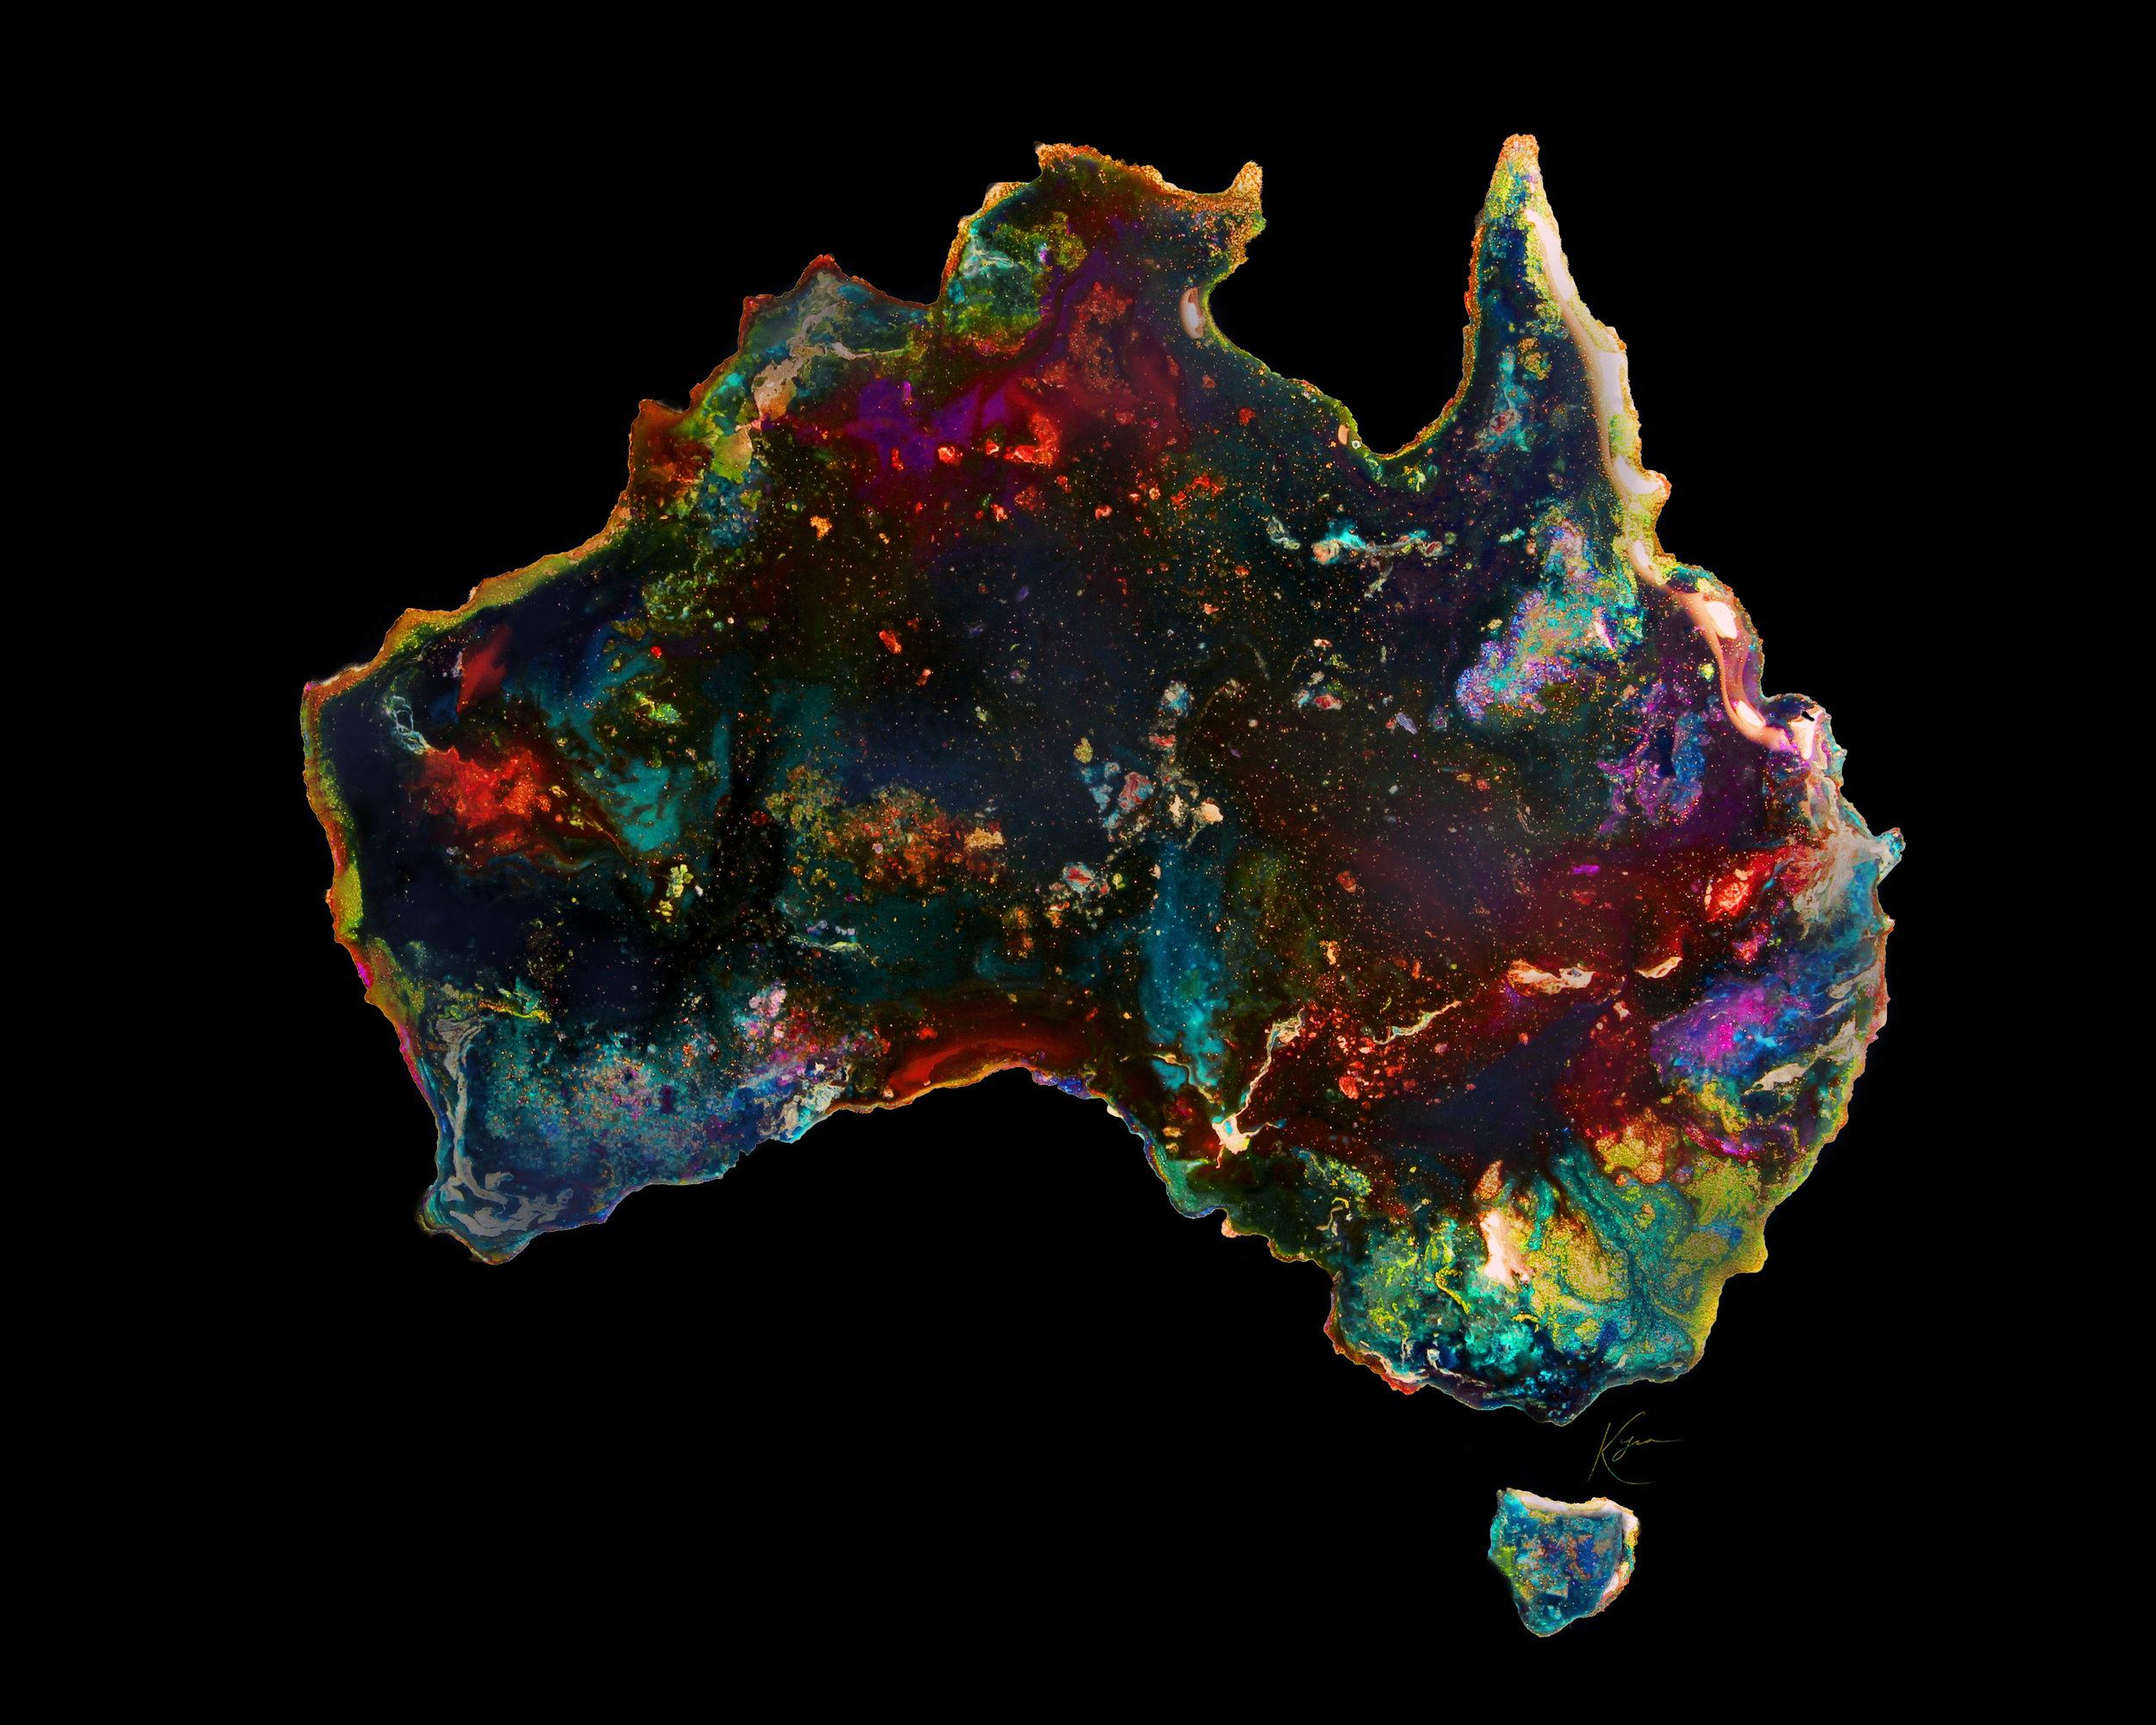 Australian opal - Private Commission